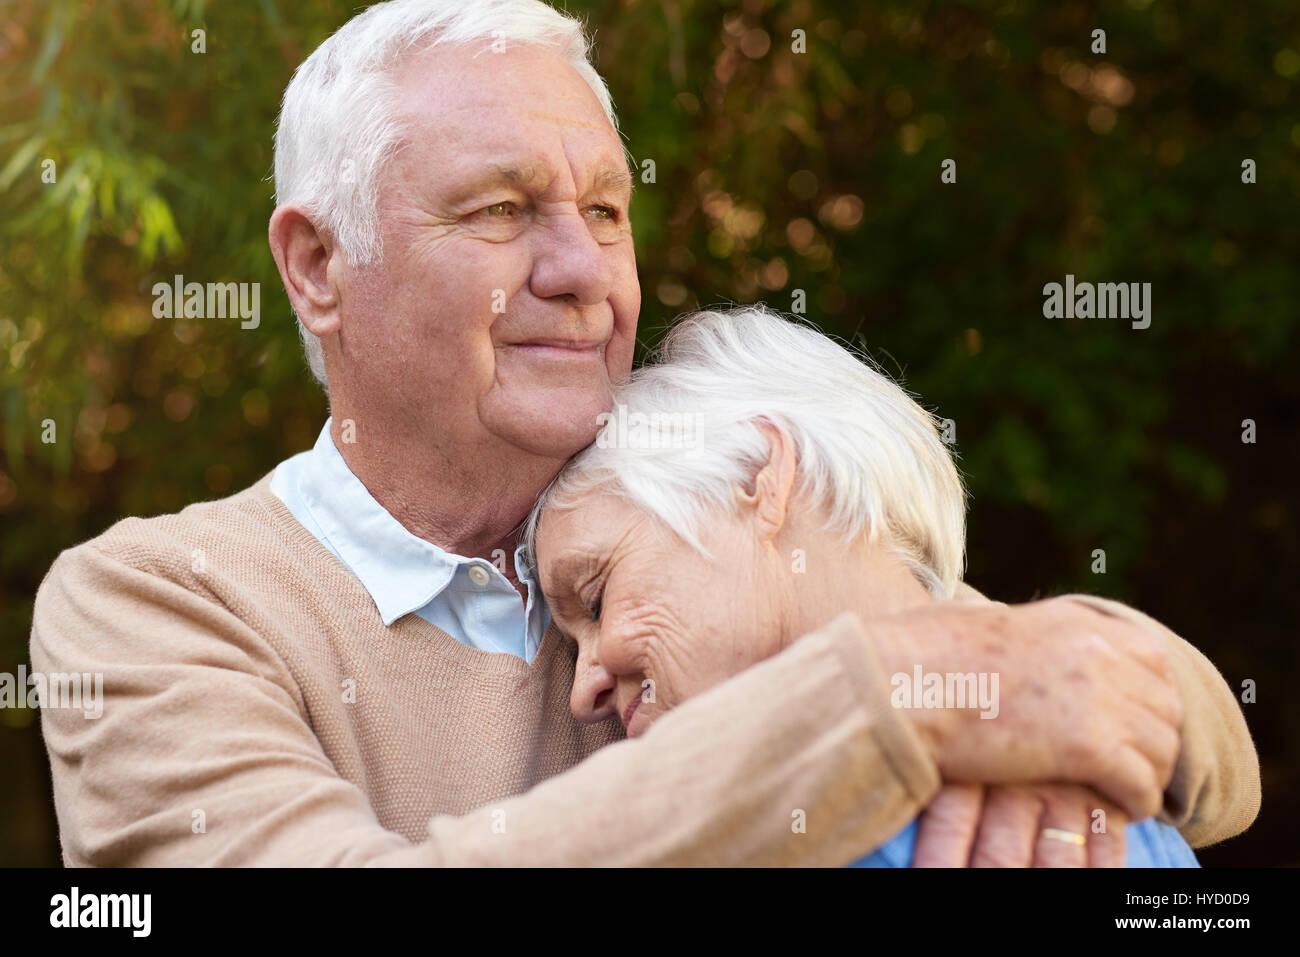 Romantic senior man warmly hugging his woman outside - Stock Image